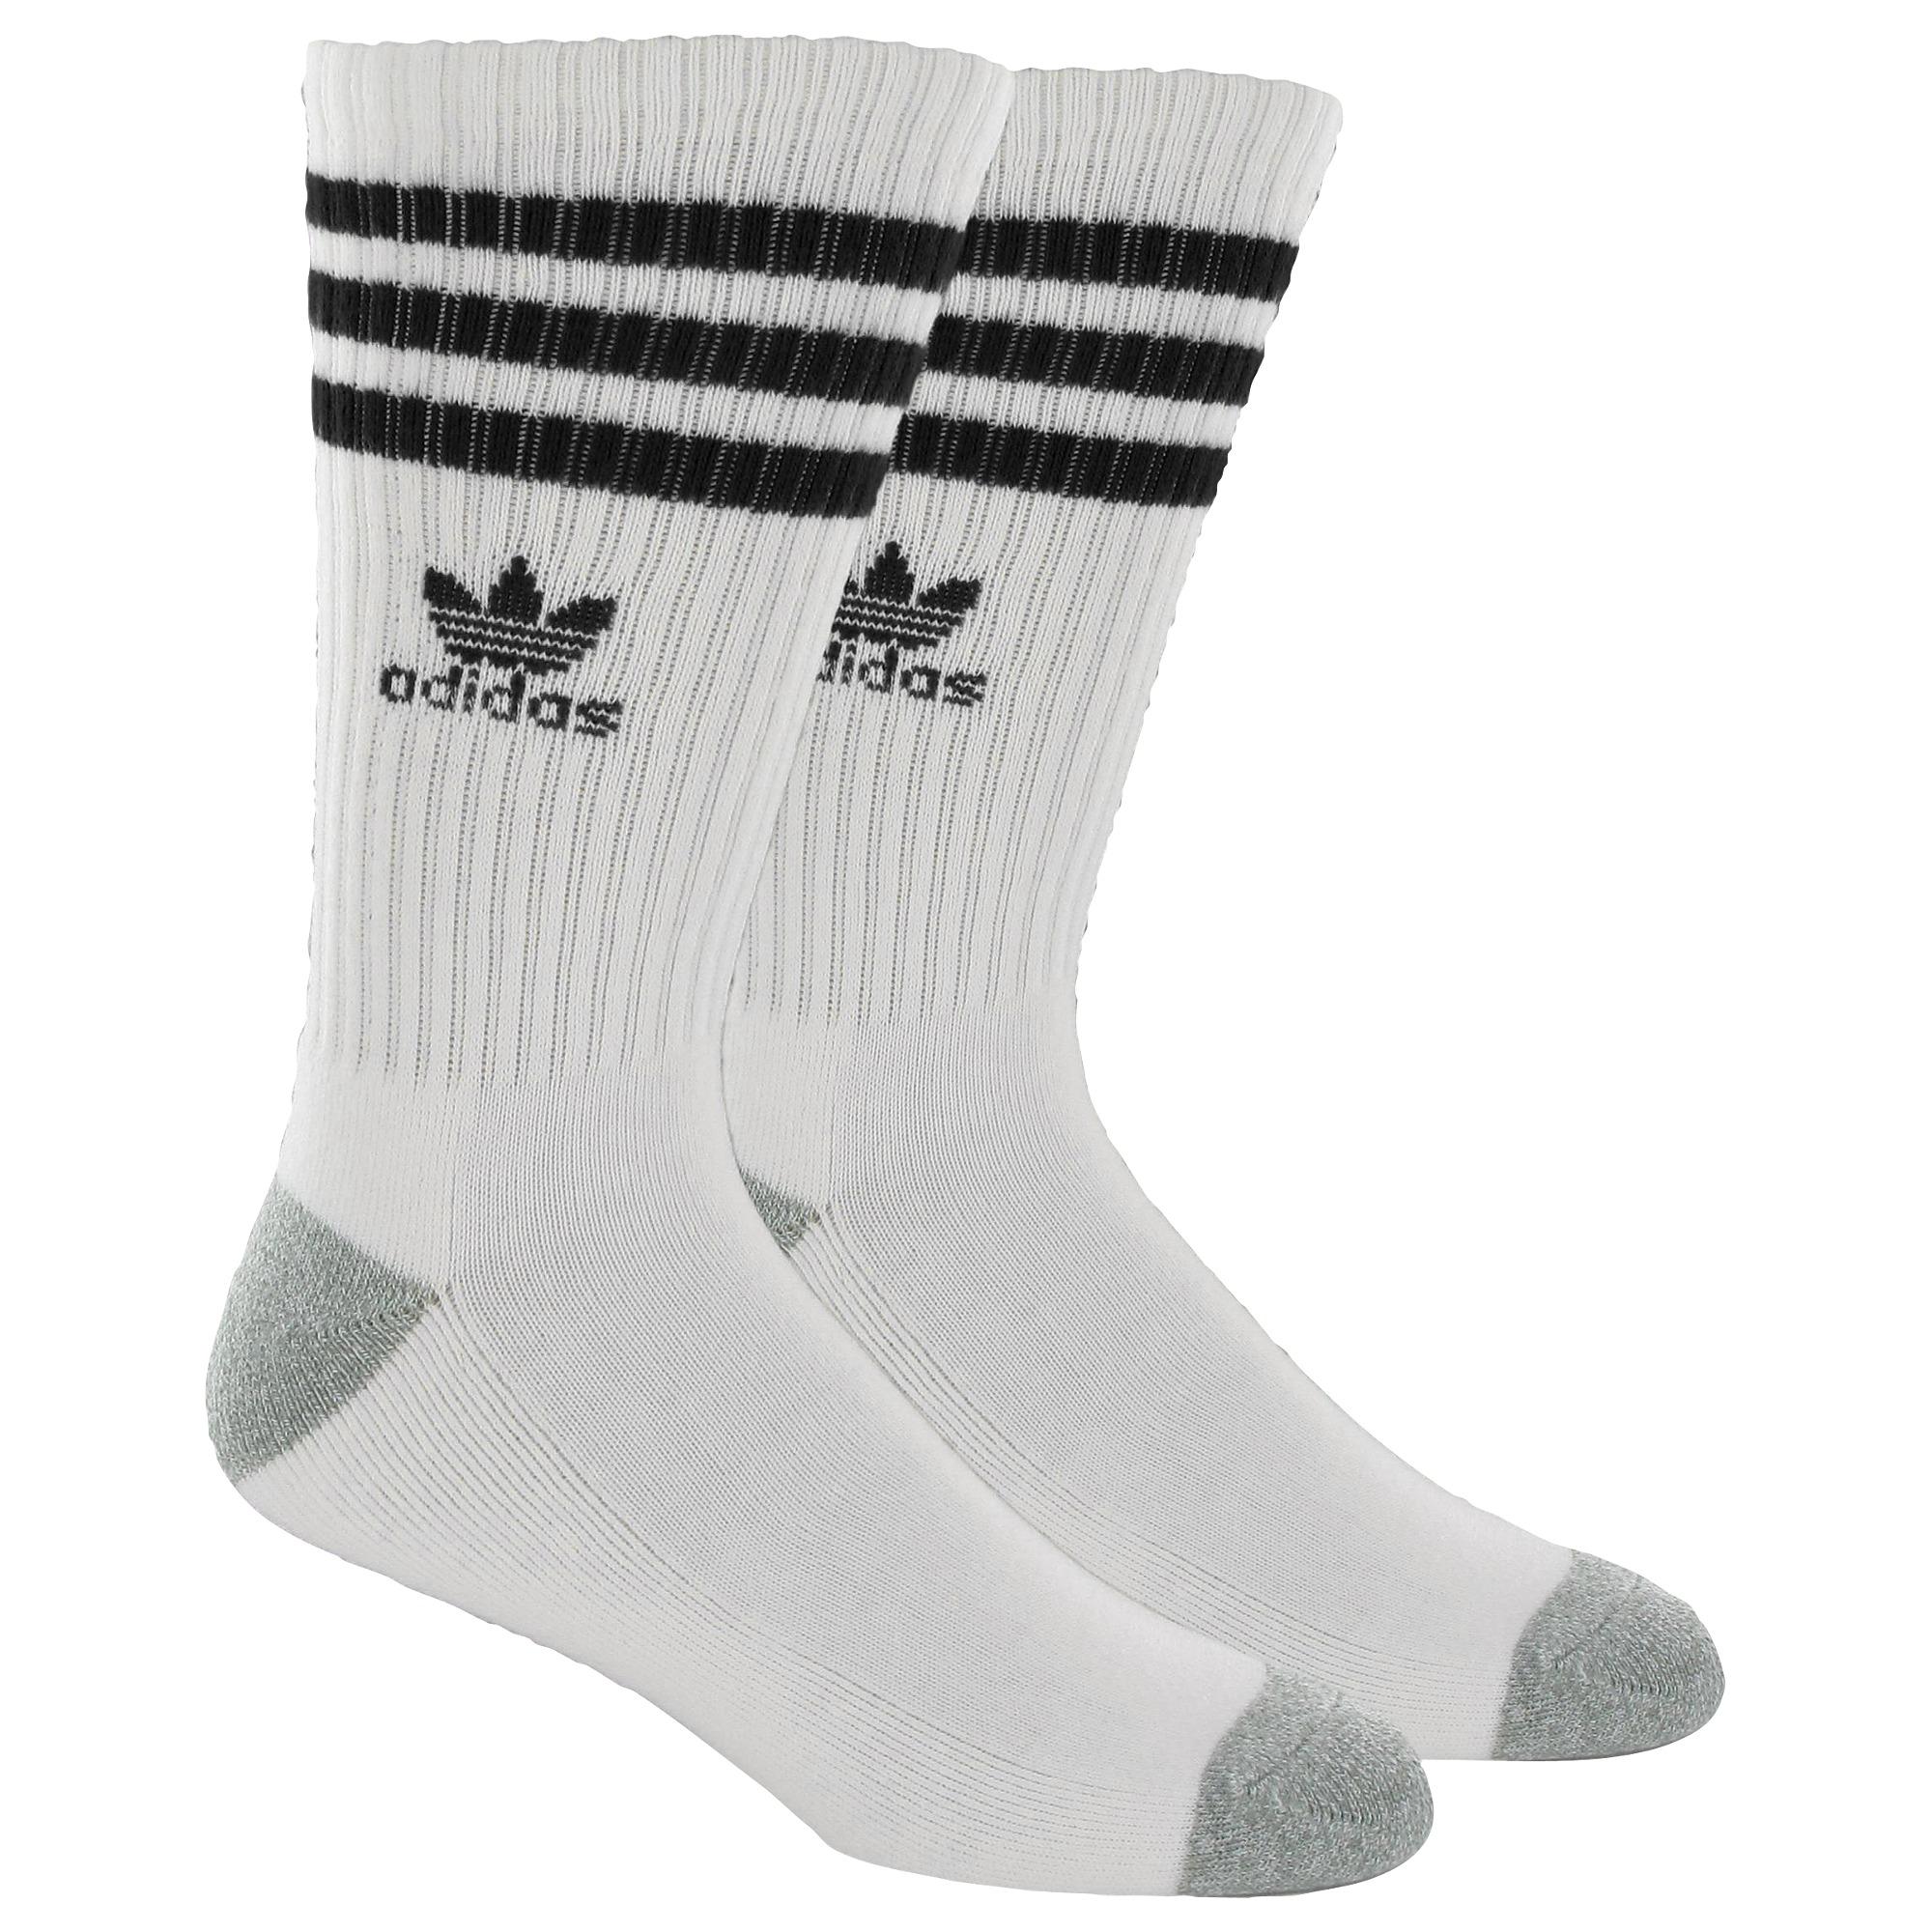 Adidas Roller Crew Socks 1 Pr White Adidas Us